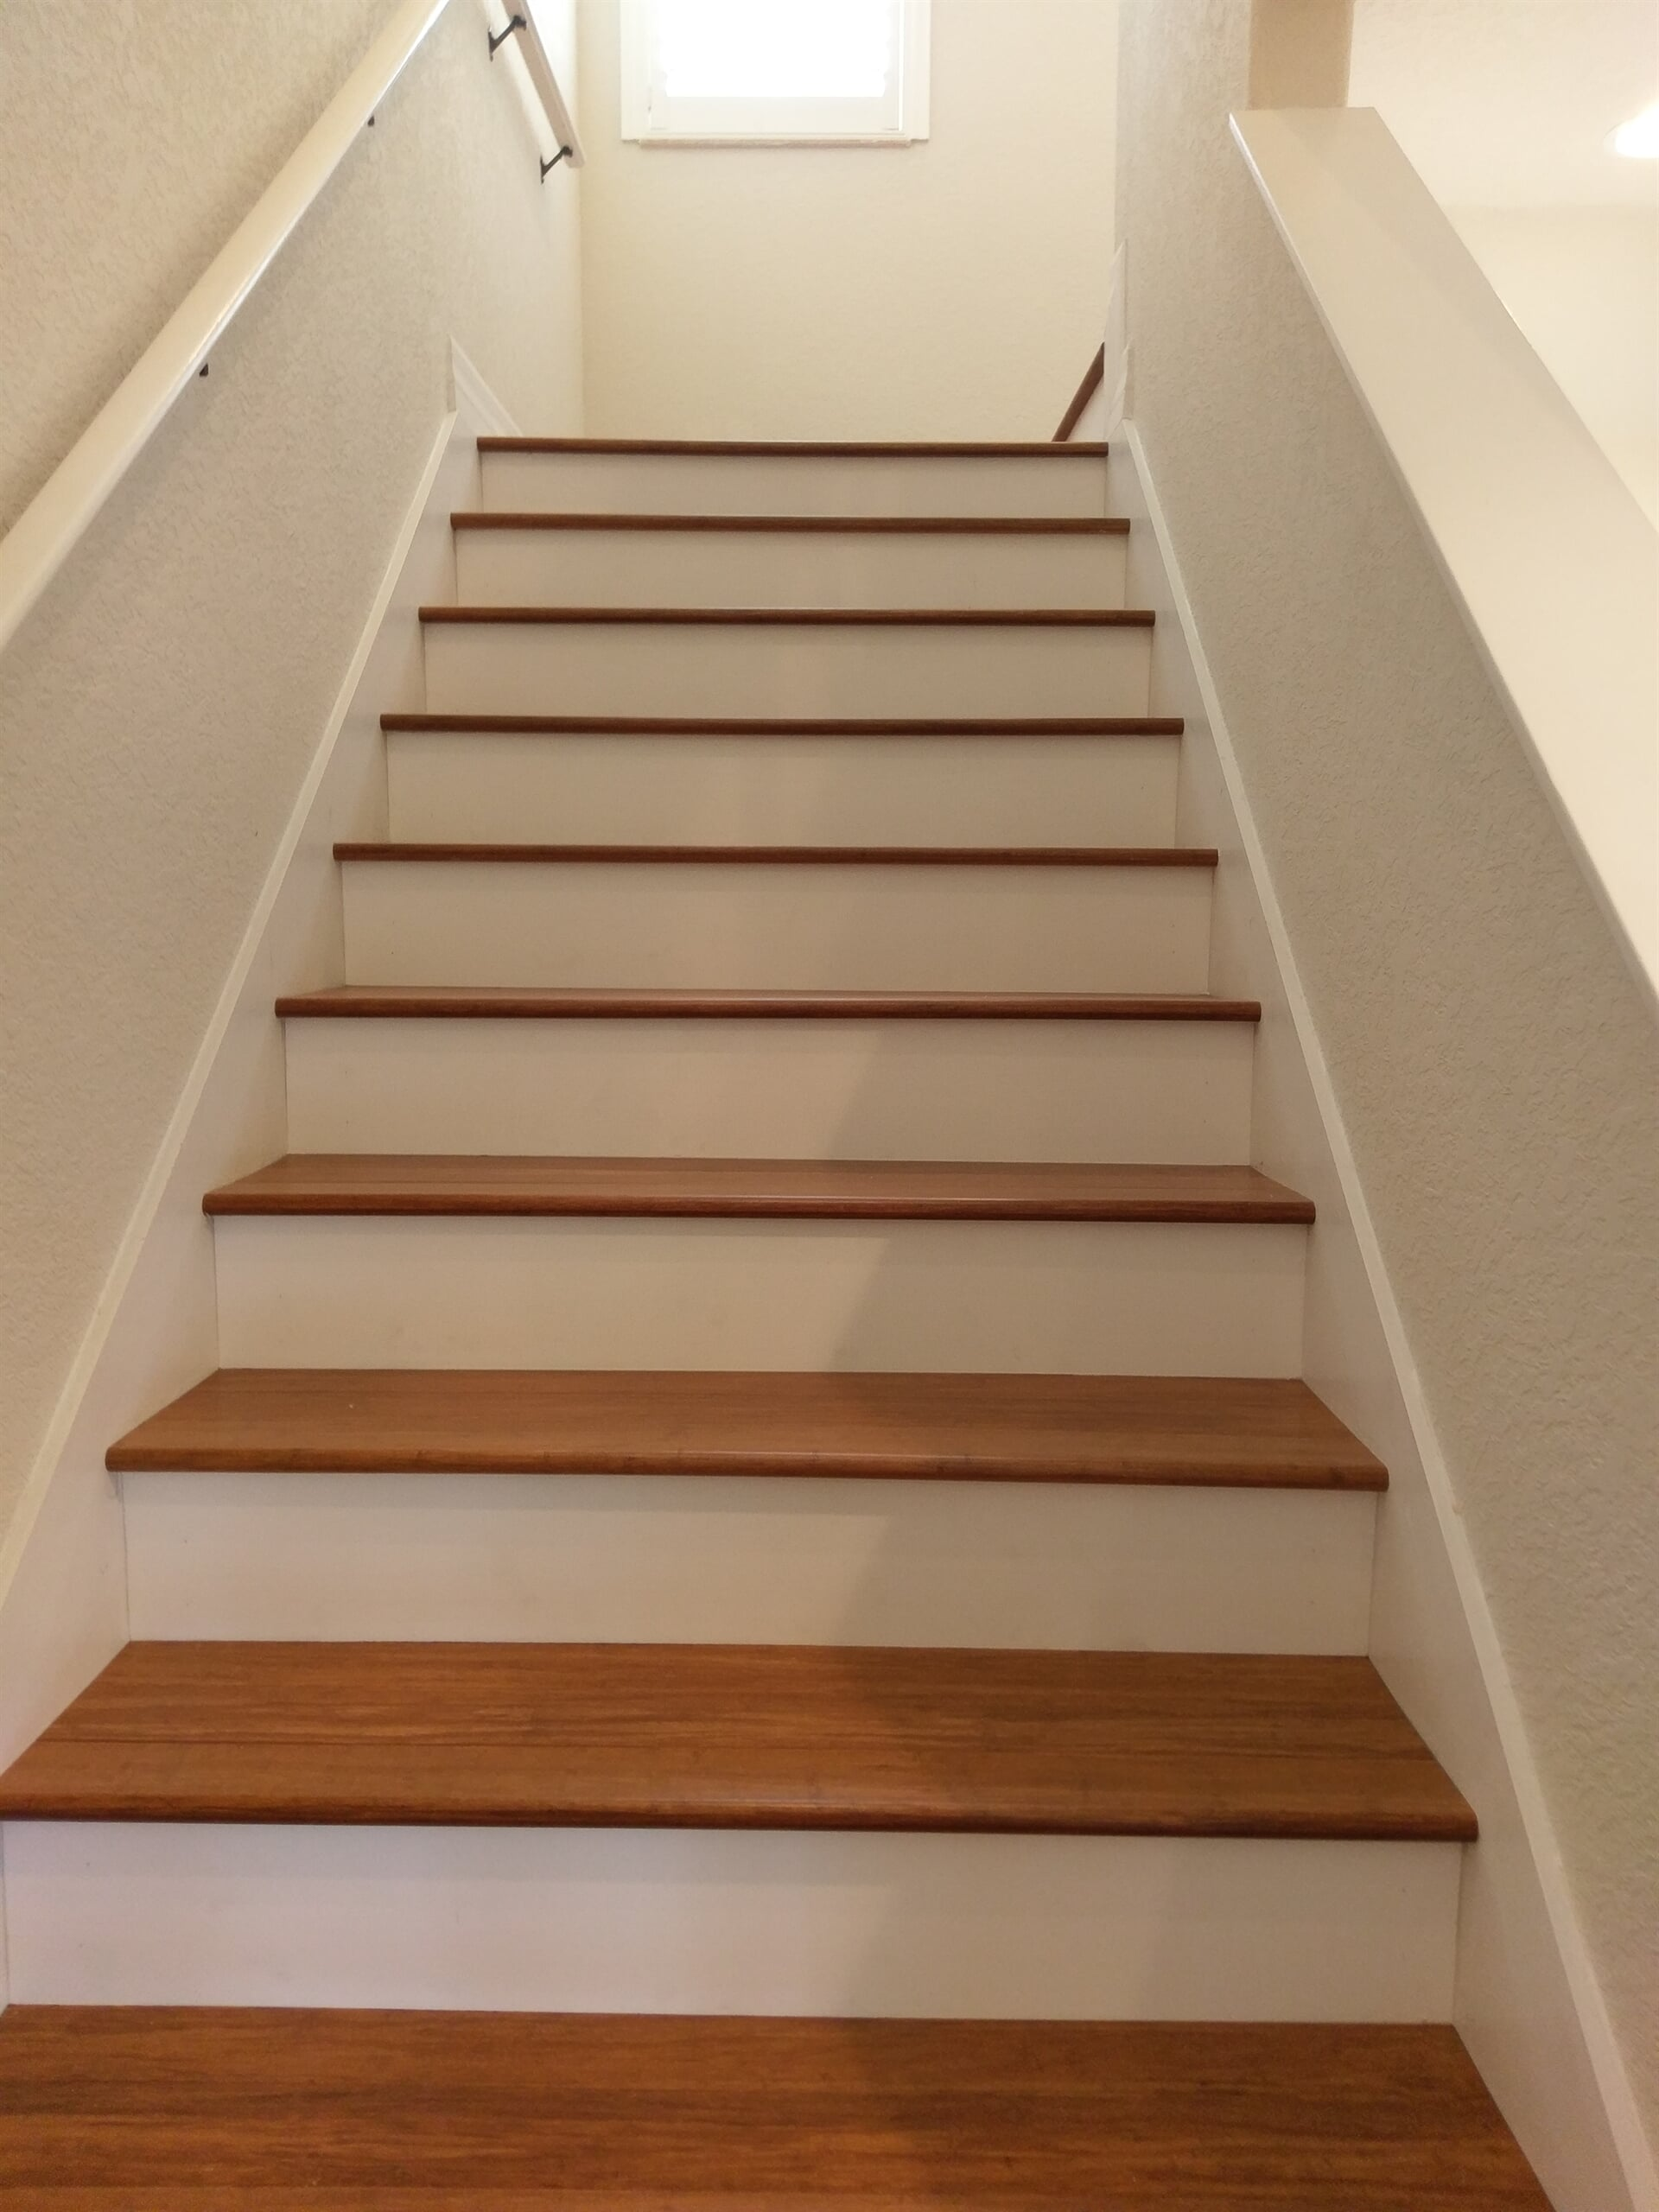 Wood stair tread in Dunedin, FL from Floor Depot